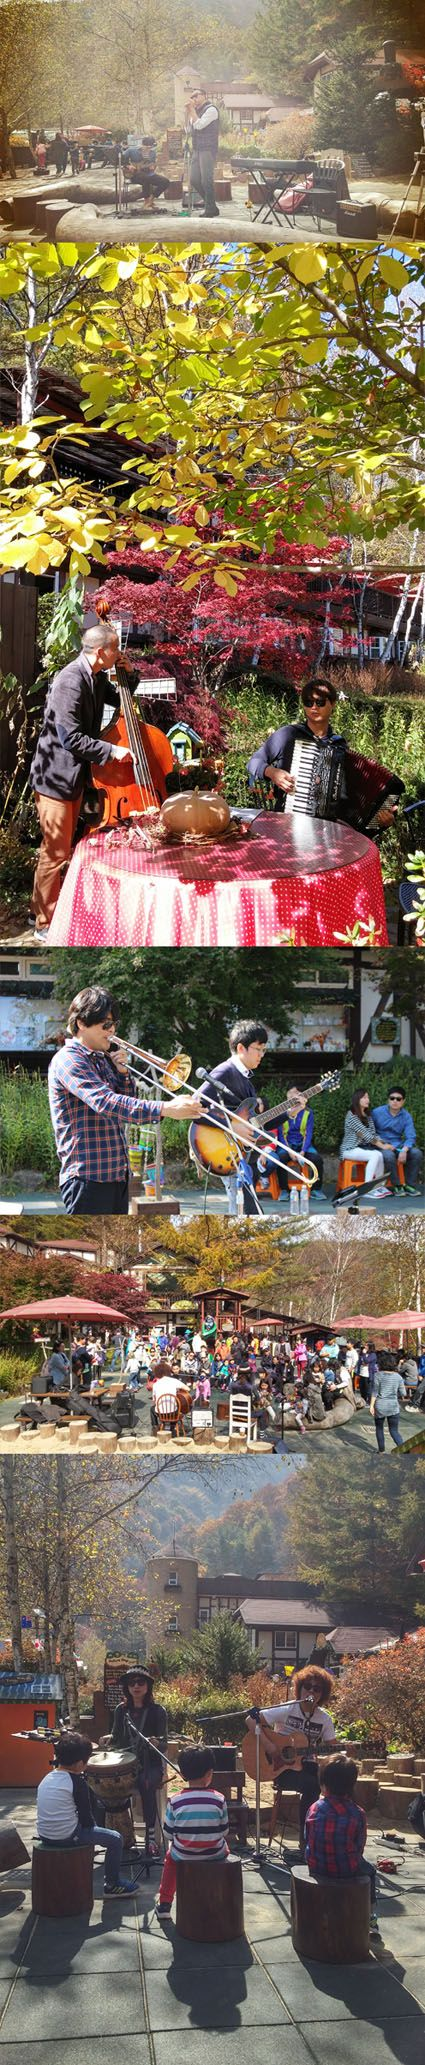 Garden Concert, Fall in Herb Festival 2014, Farm Herbnara, Korea